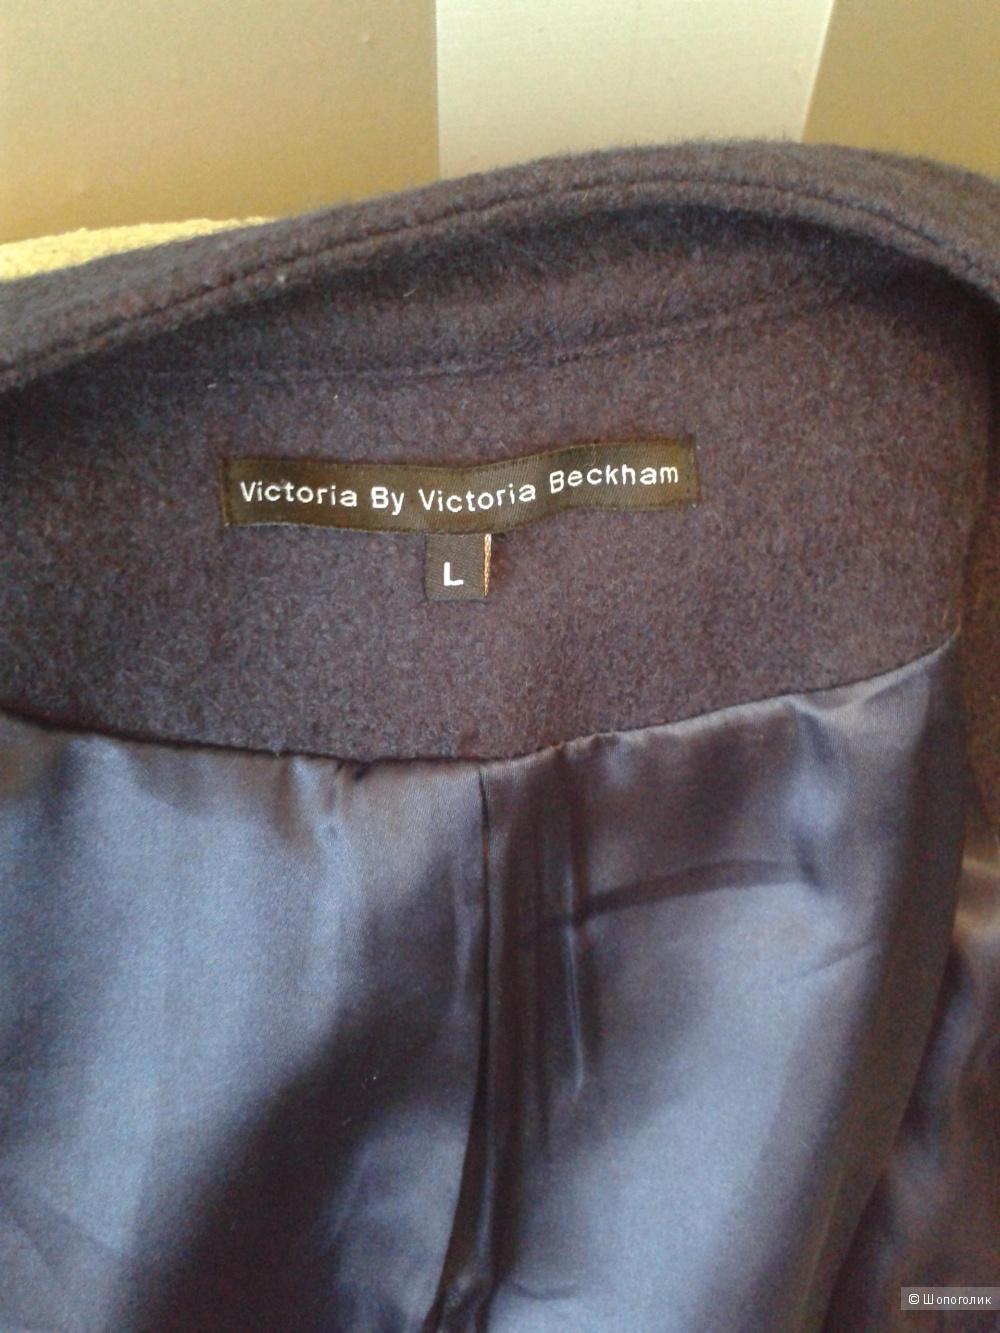 Пальто, Victoria Beckham,размер L.